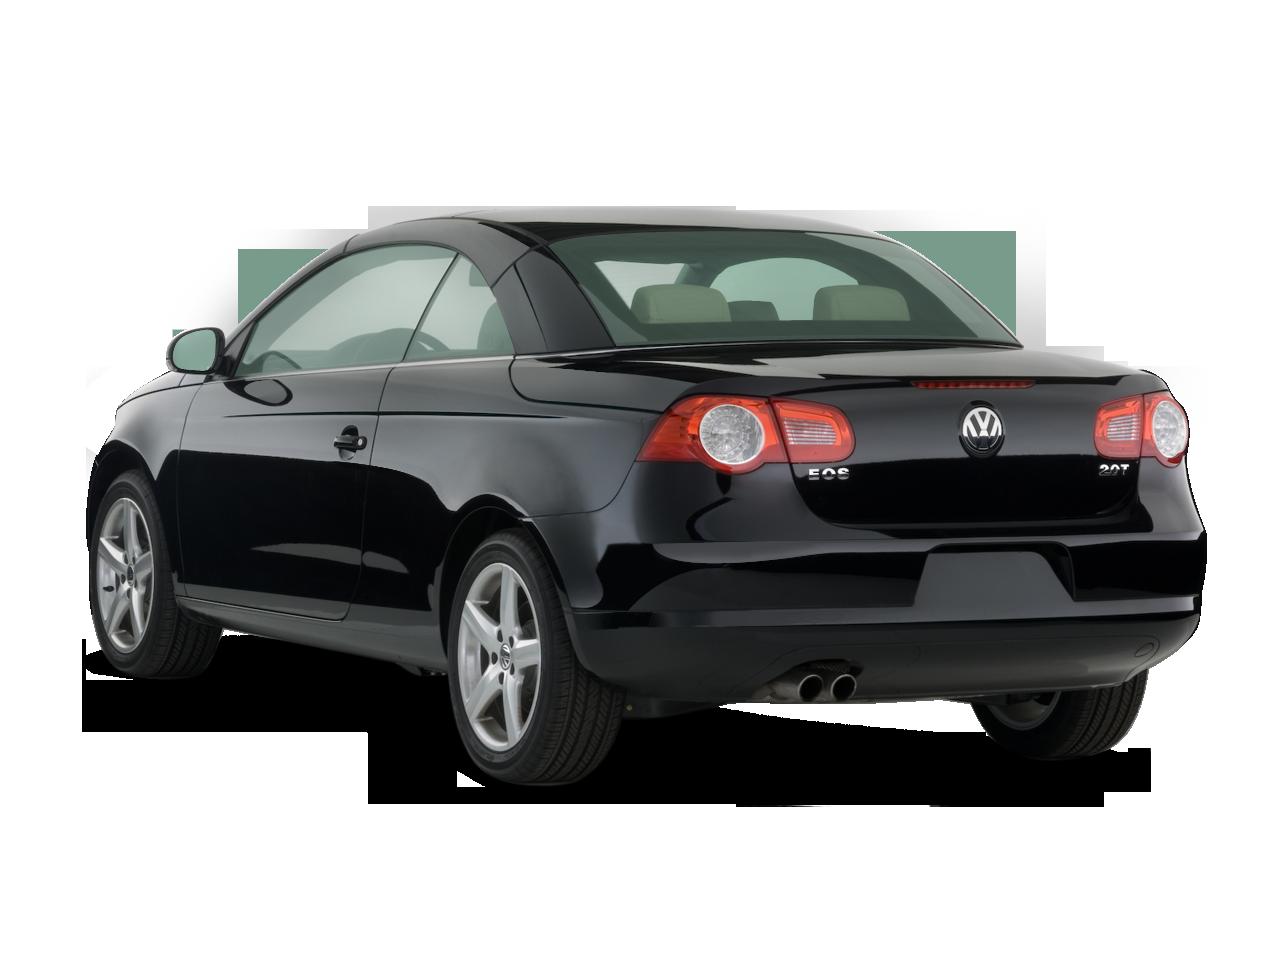 2007 Volkswagen Eos New Car Review Automobile Magazine